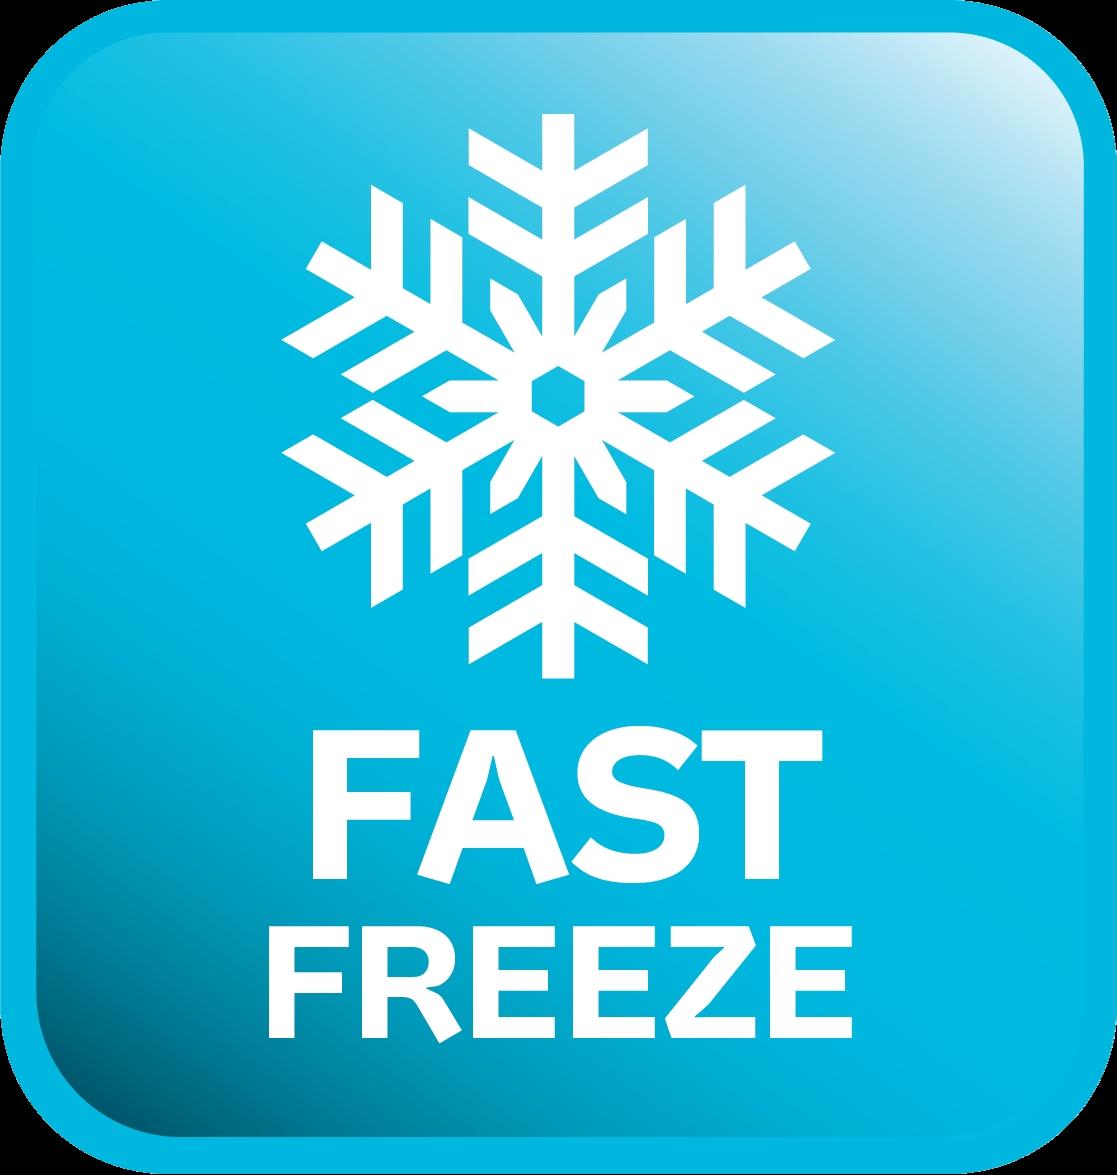 Fast Freeze